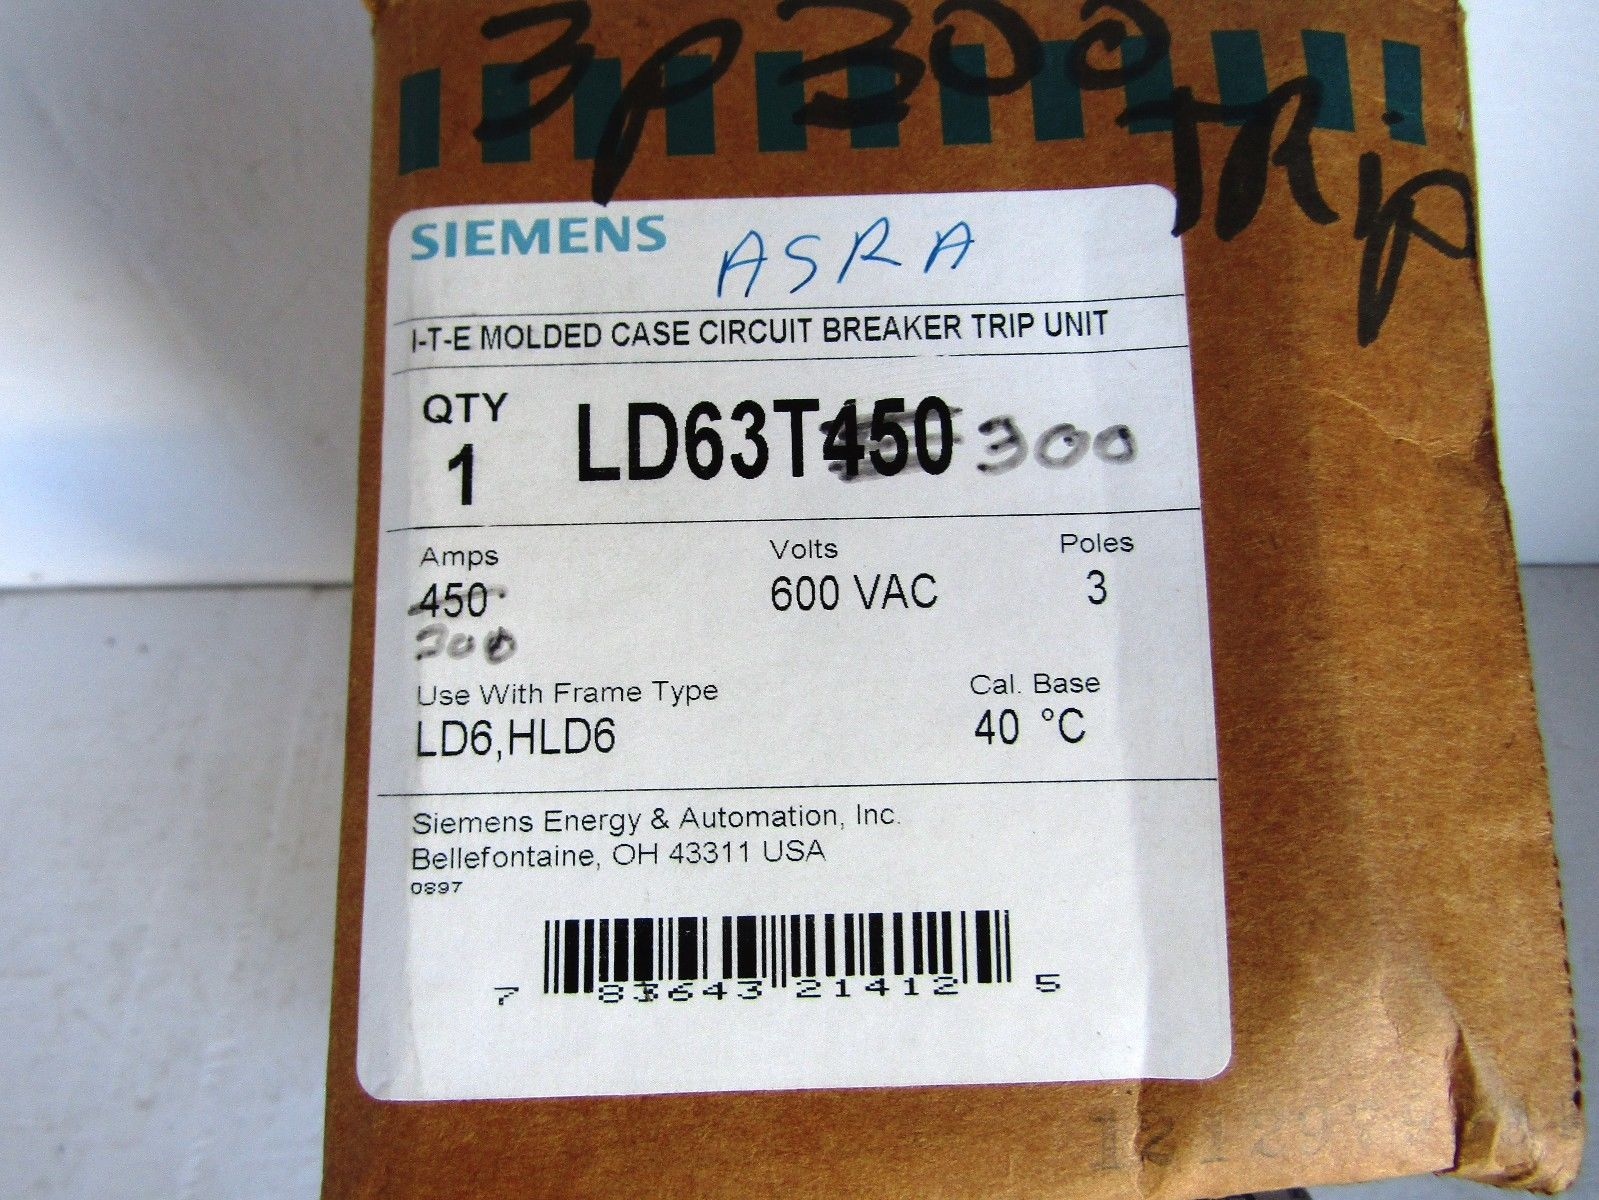 NEW SIEMENS LD63T300 300 AMP 600 VOLT TYPE LD6 CIRCUIT BREAKER TRIP ...